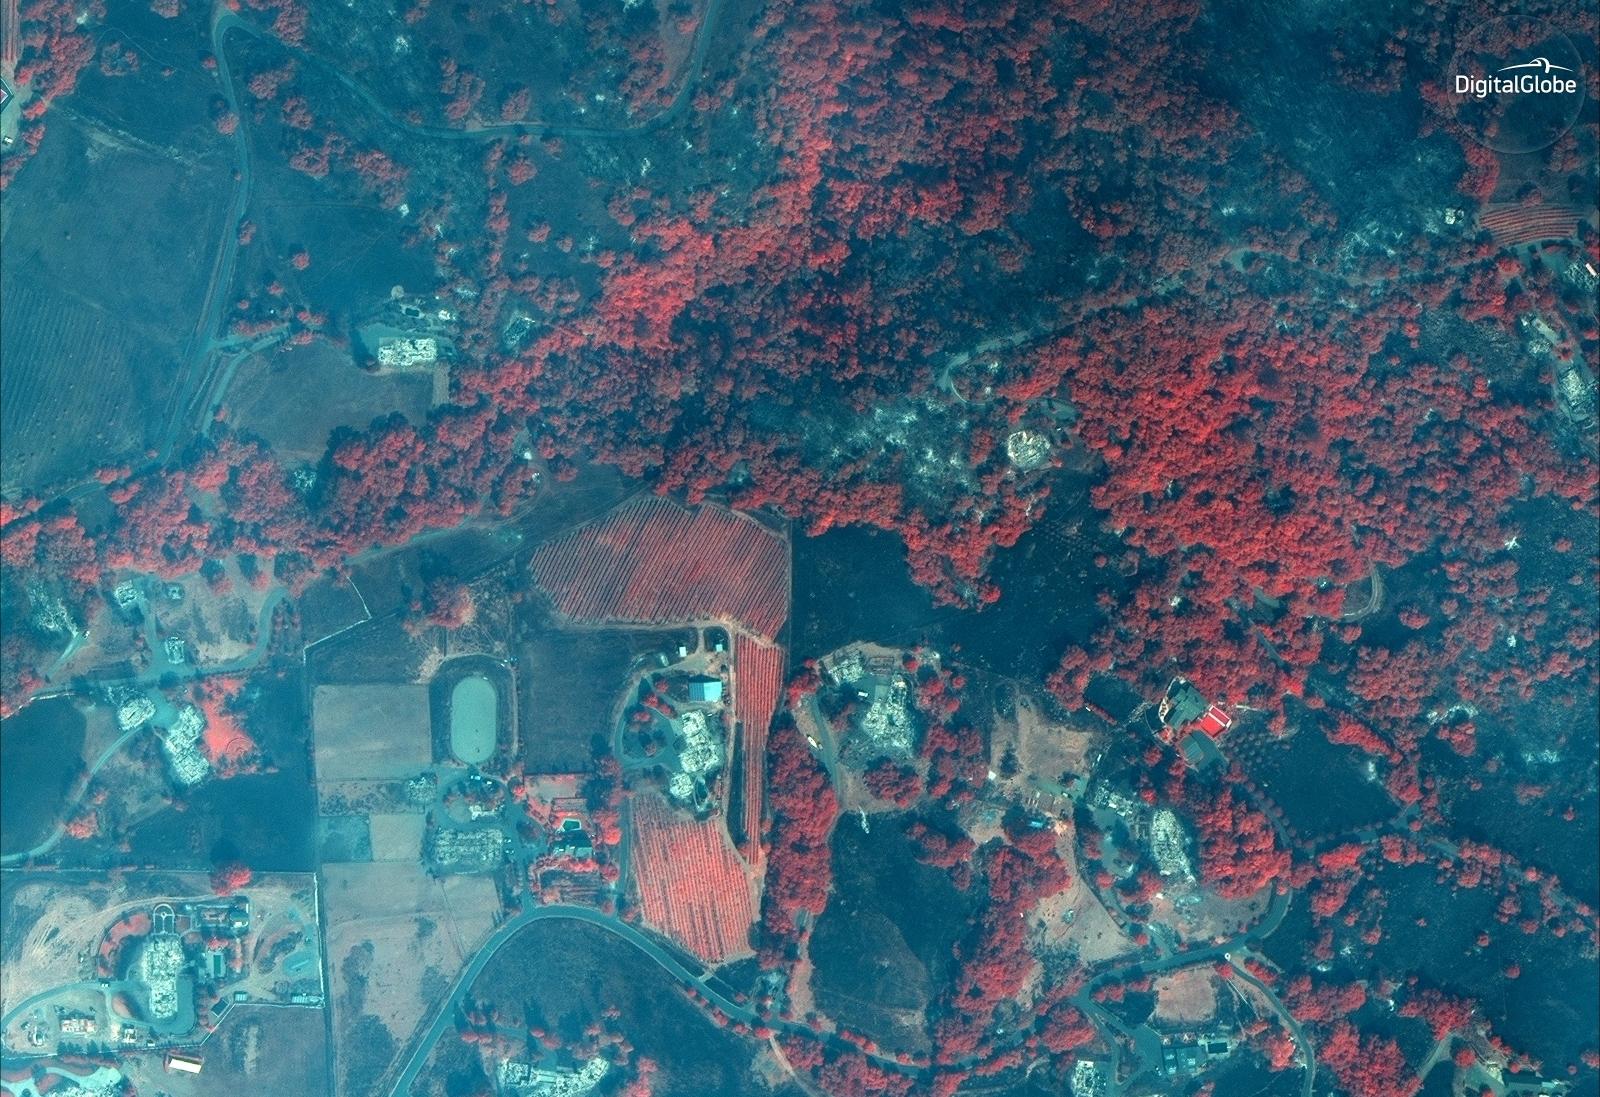 California Santa Rosa Fire Damage October